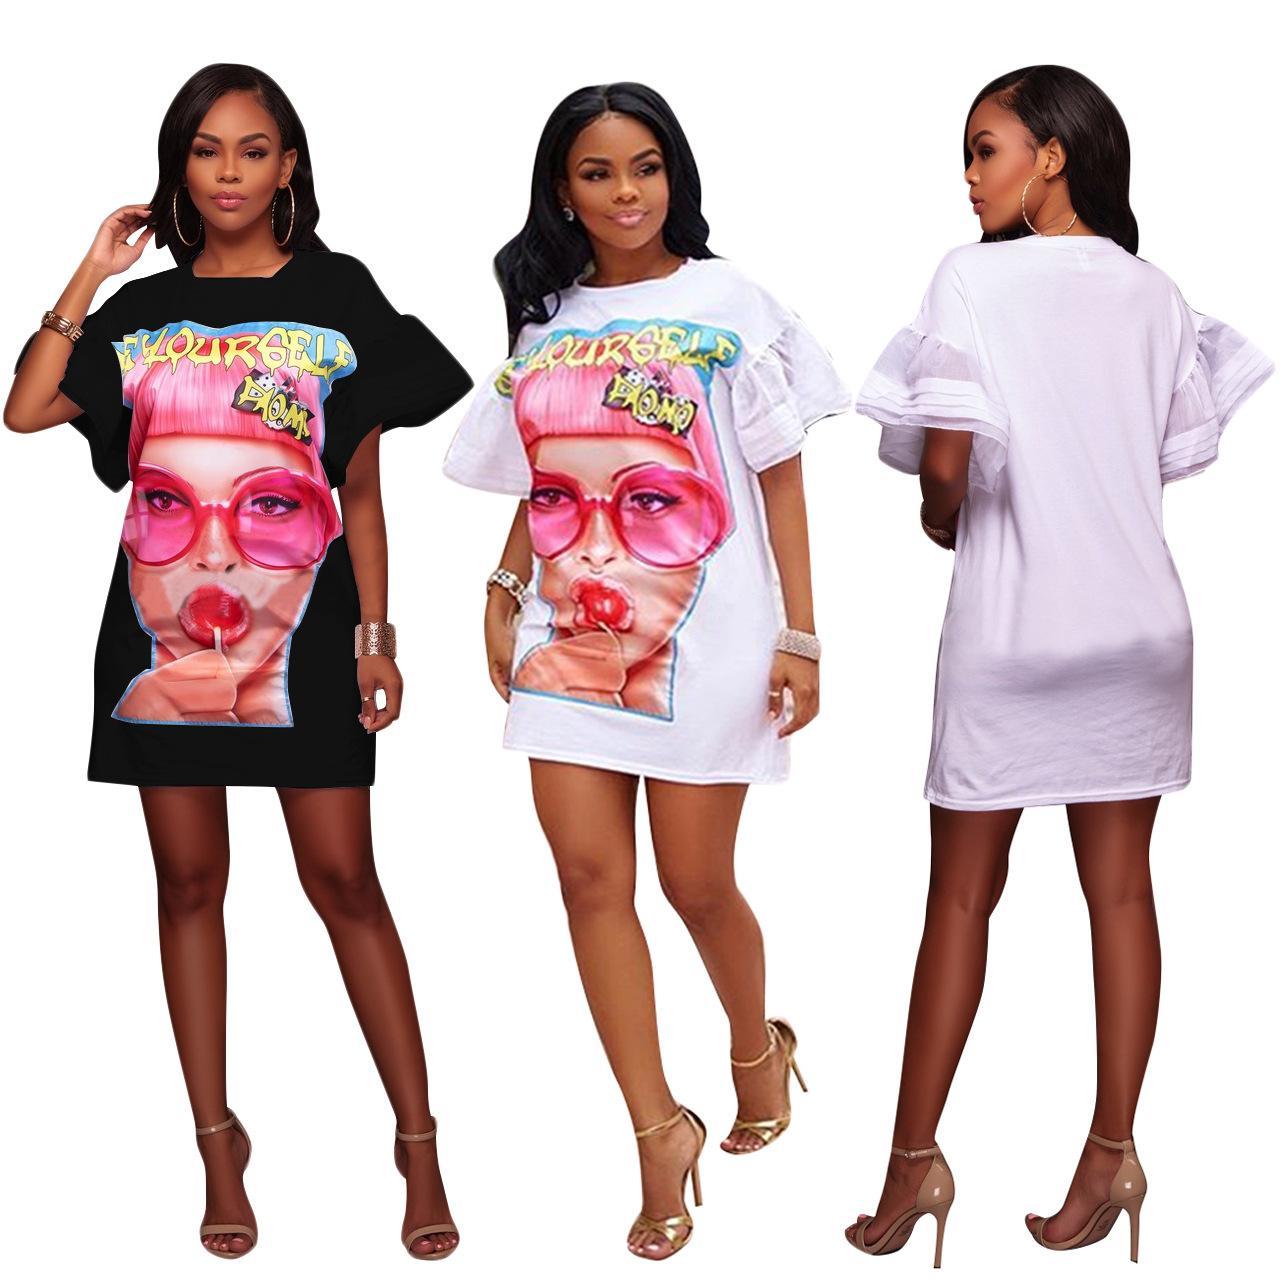 2018 Casual NEW Women Vintage Bohemian Floral Print Long Top Blouse T Shirt Loose Mini Short Dress Beauty Girl Plus Size